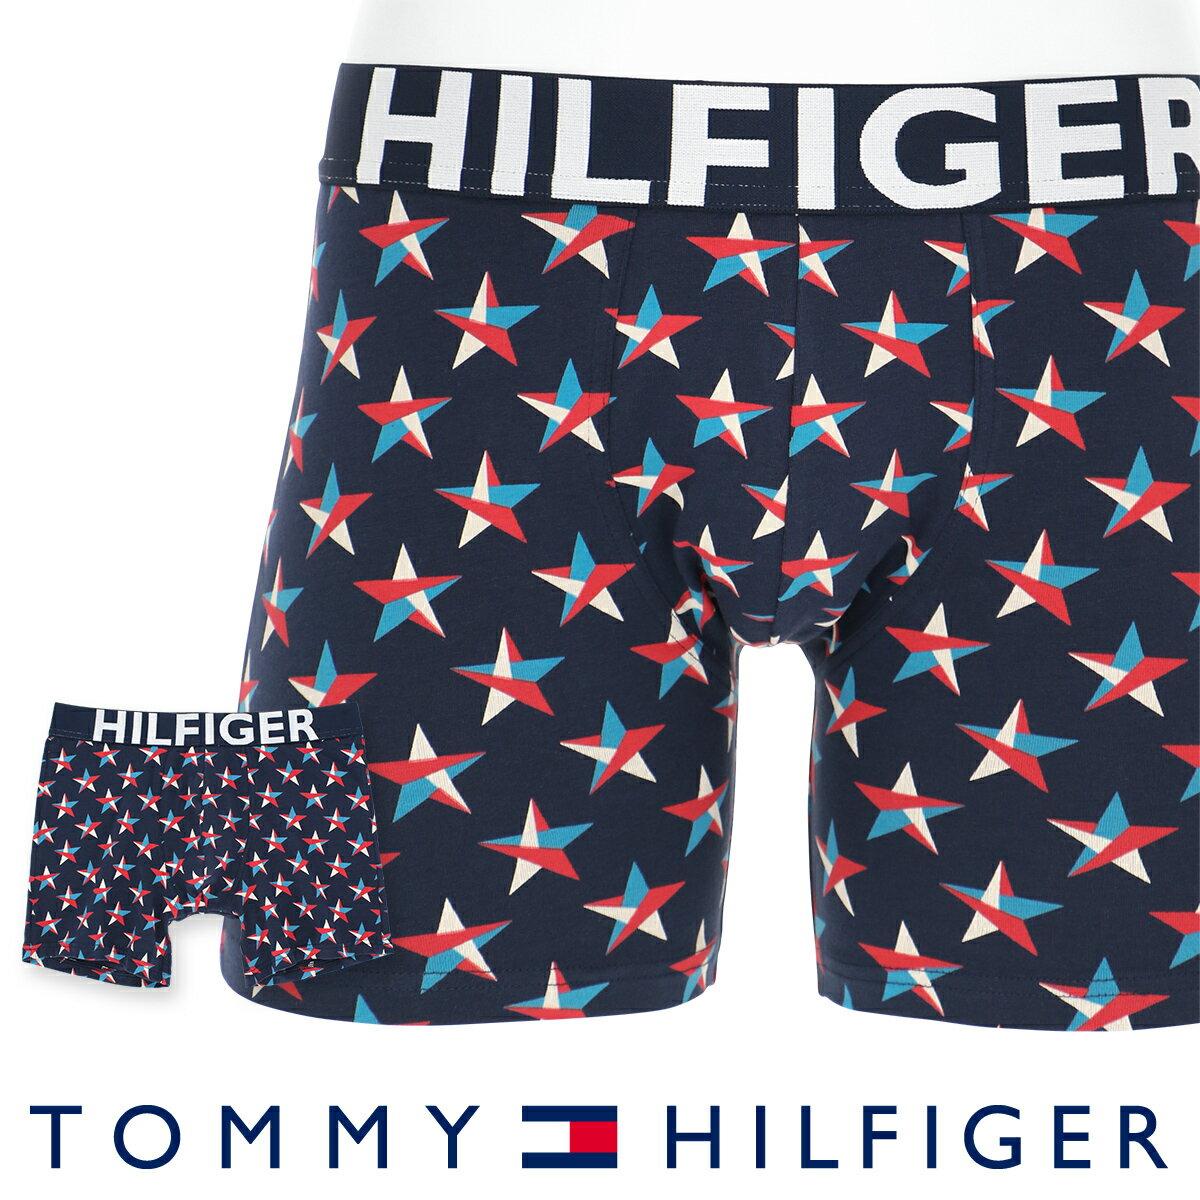 TOMMY HILFIGER|トミーヒルフィガーHILFIGER CTN BOXER BRIEF COLOR STARSヒルフィガー カラースターズ コットン ロングボクサーパンツ5338-0740男性 下着 メンズ プレゼント ギフト 誕生日ポイント10倍